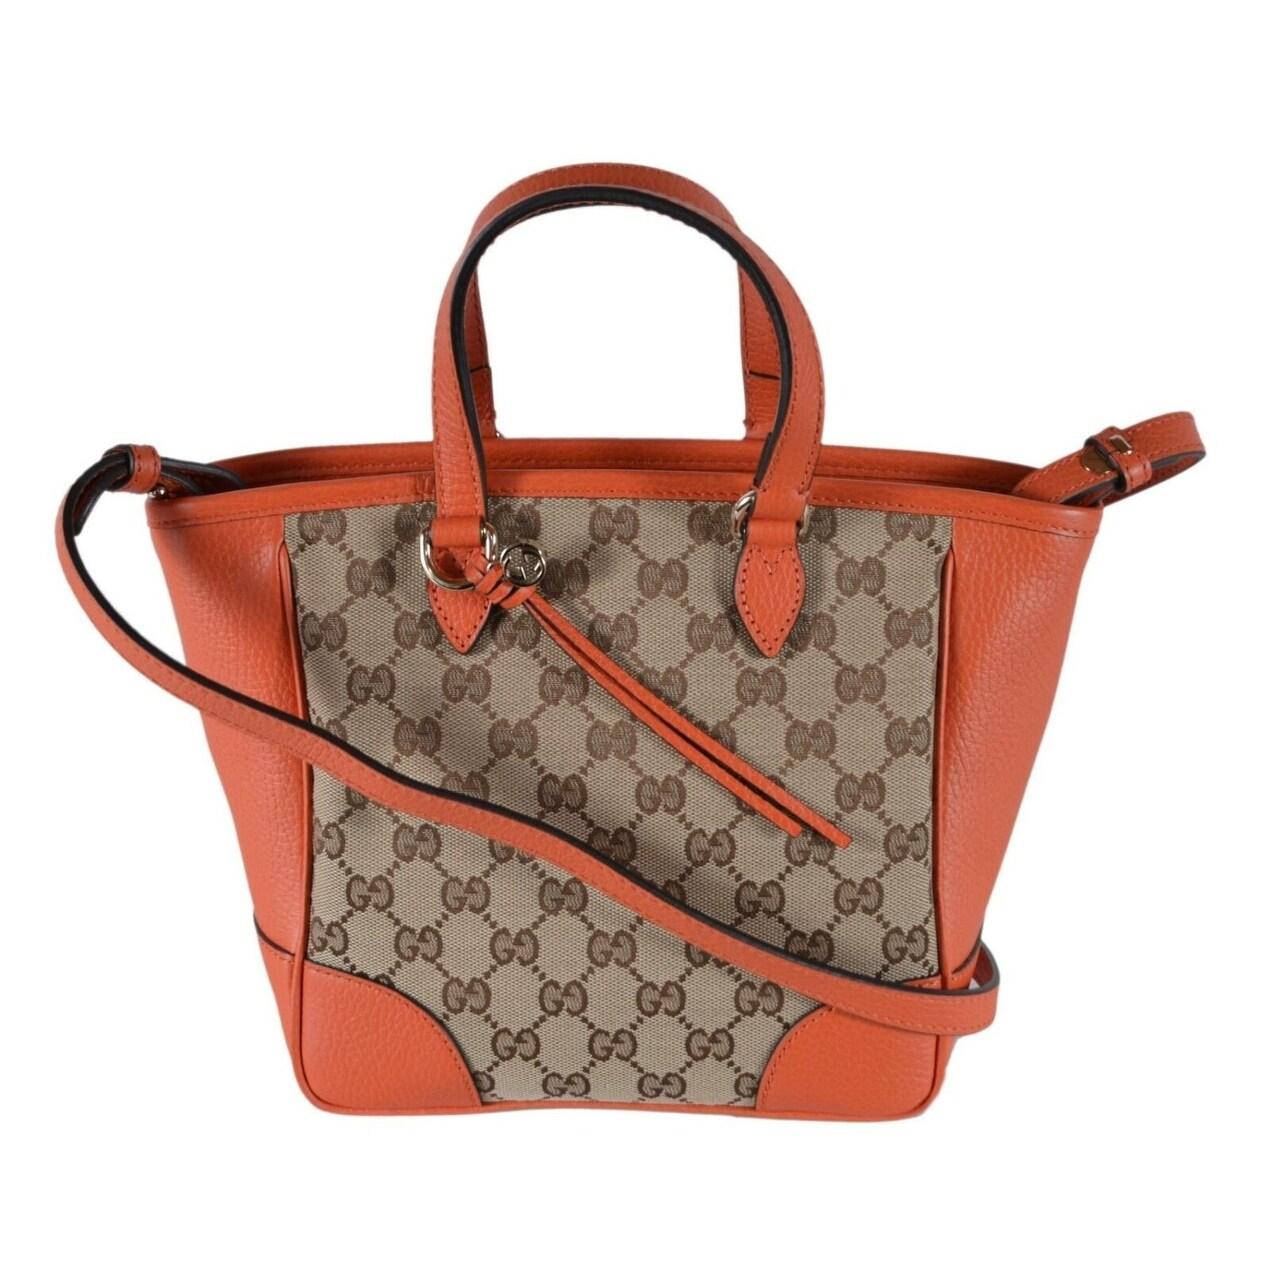 23bca8788 Cross-body Designer Handbags | Find Great Designer Store Deals Shopping at  Overstock